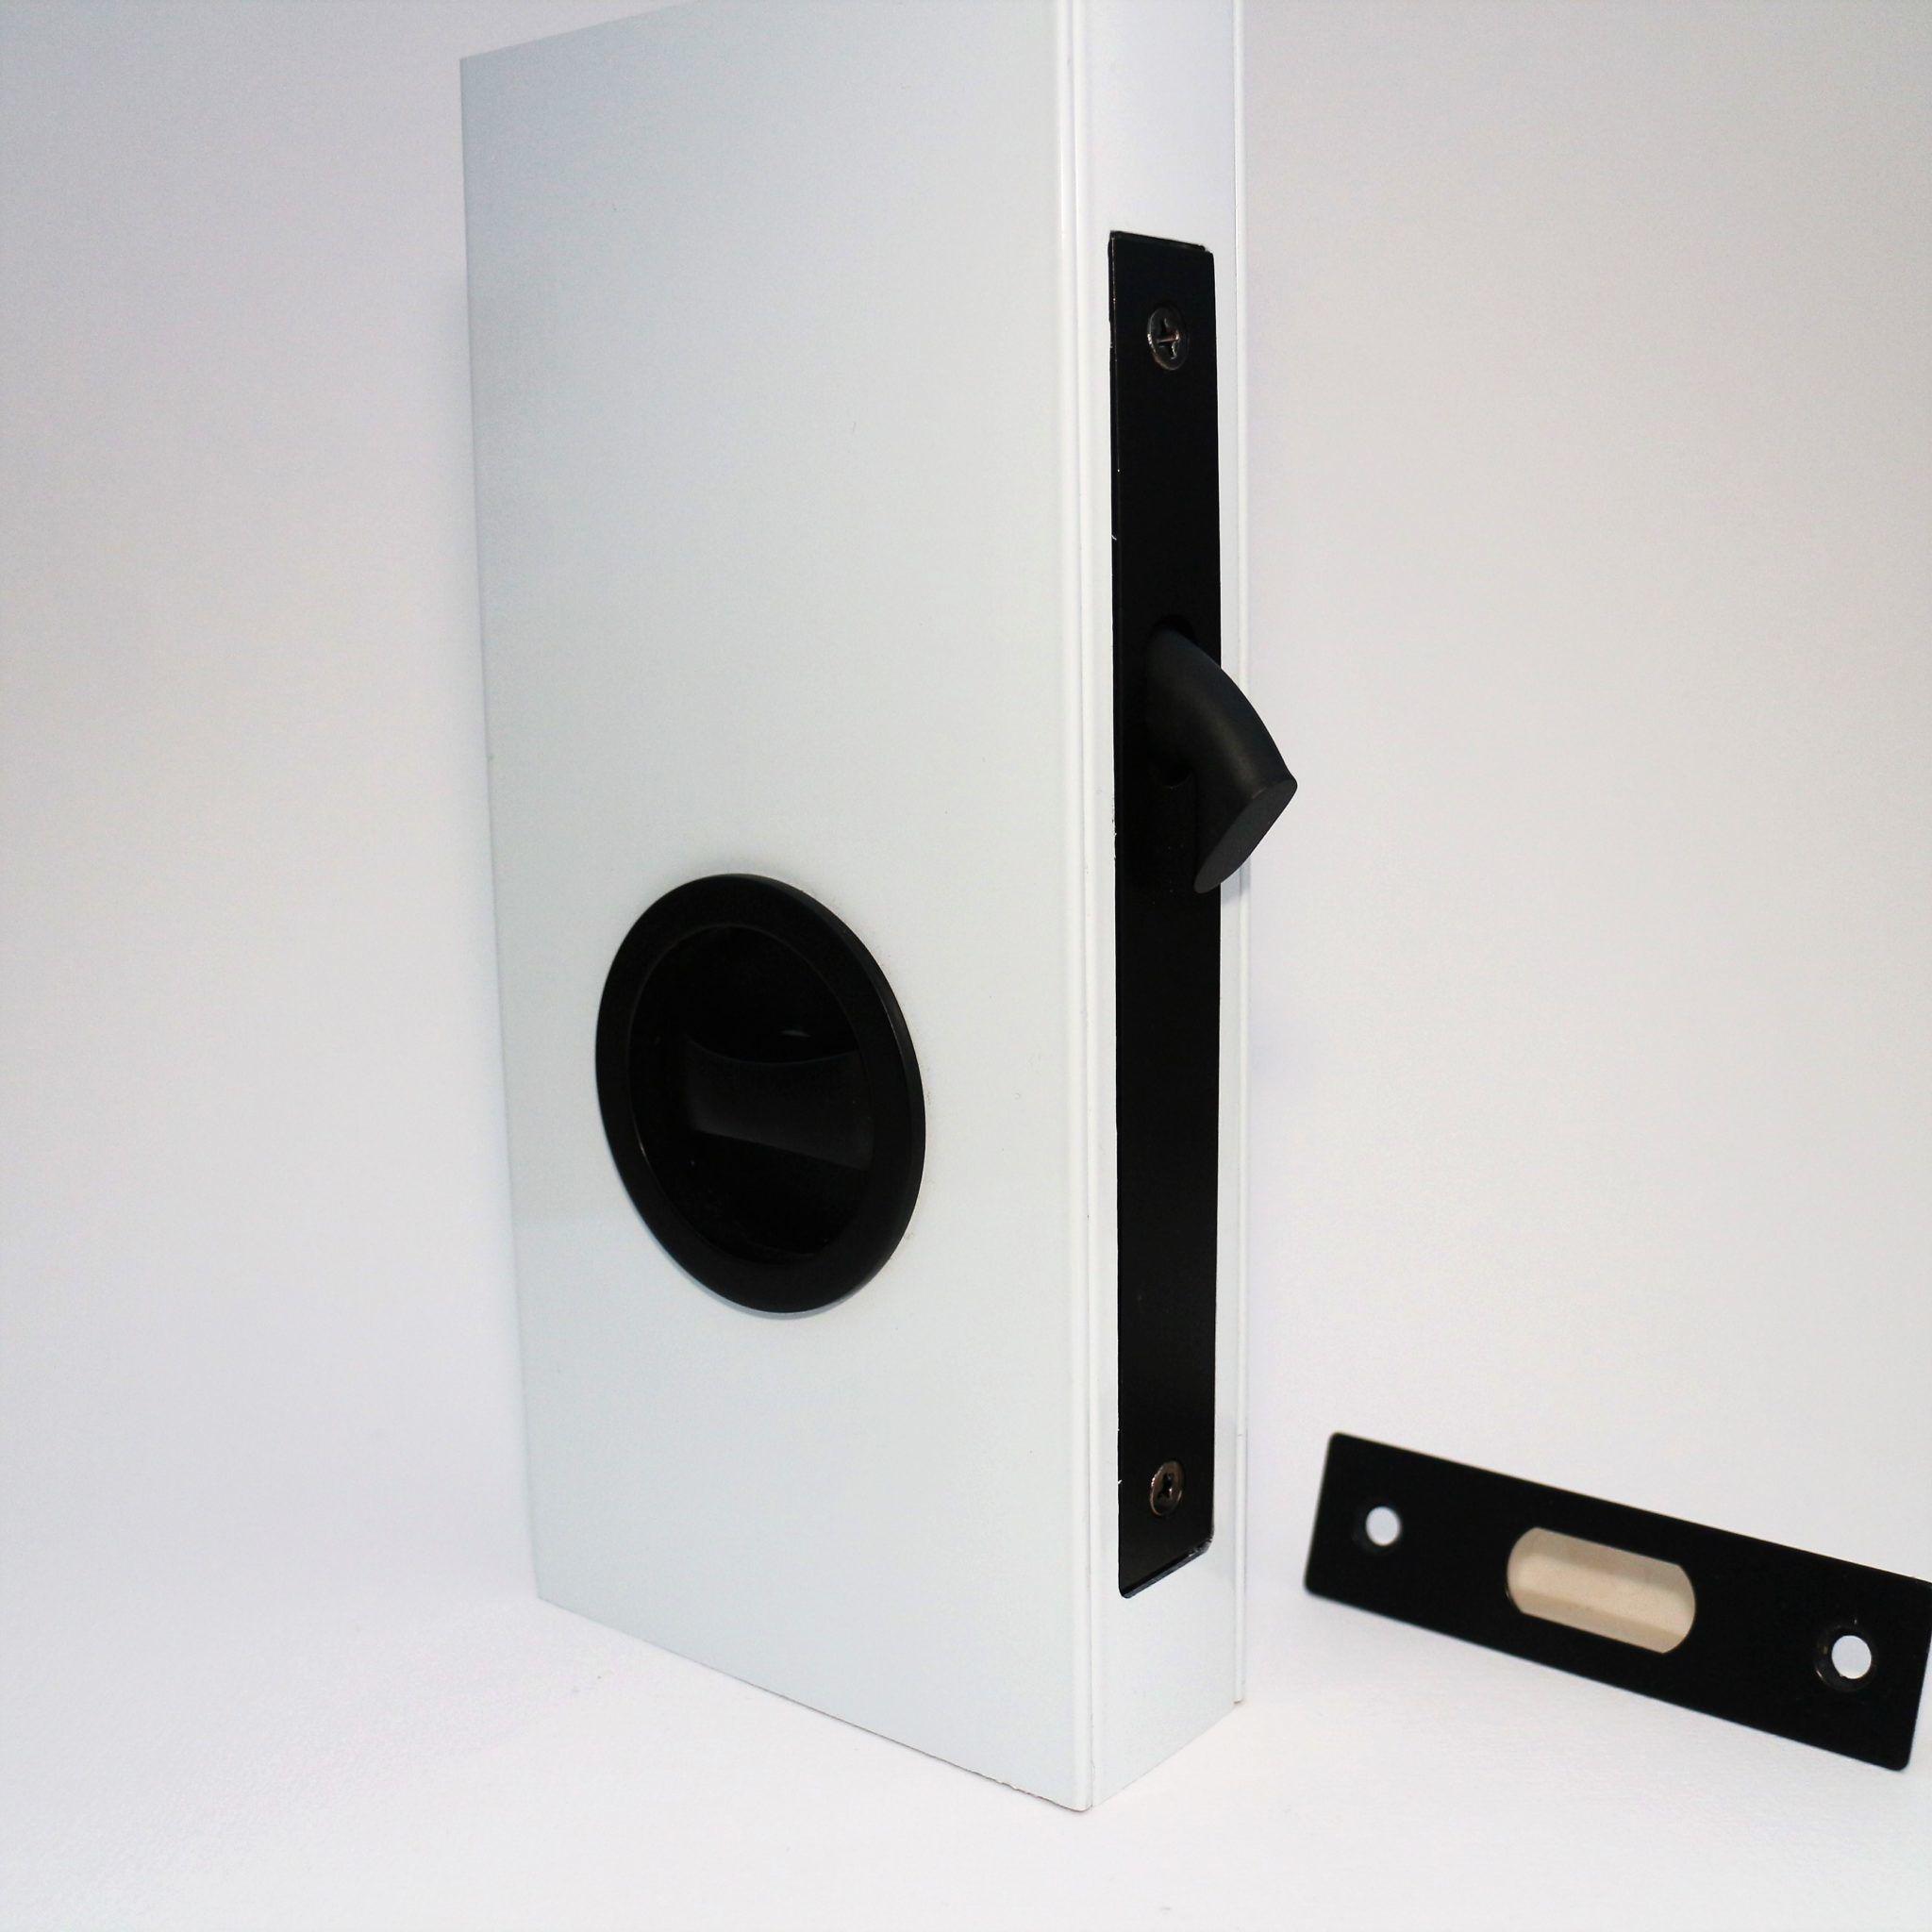 Privacy cavity lock